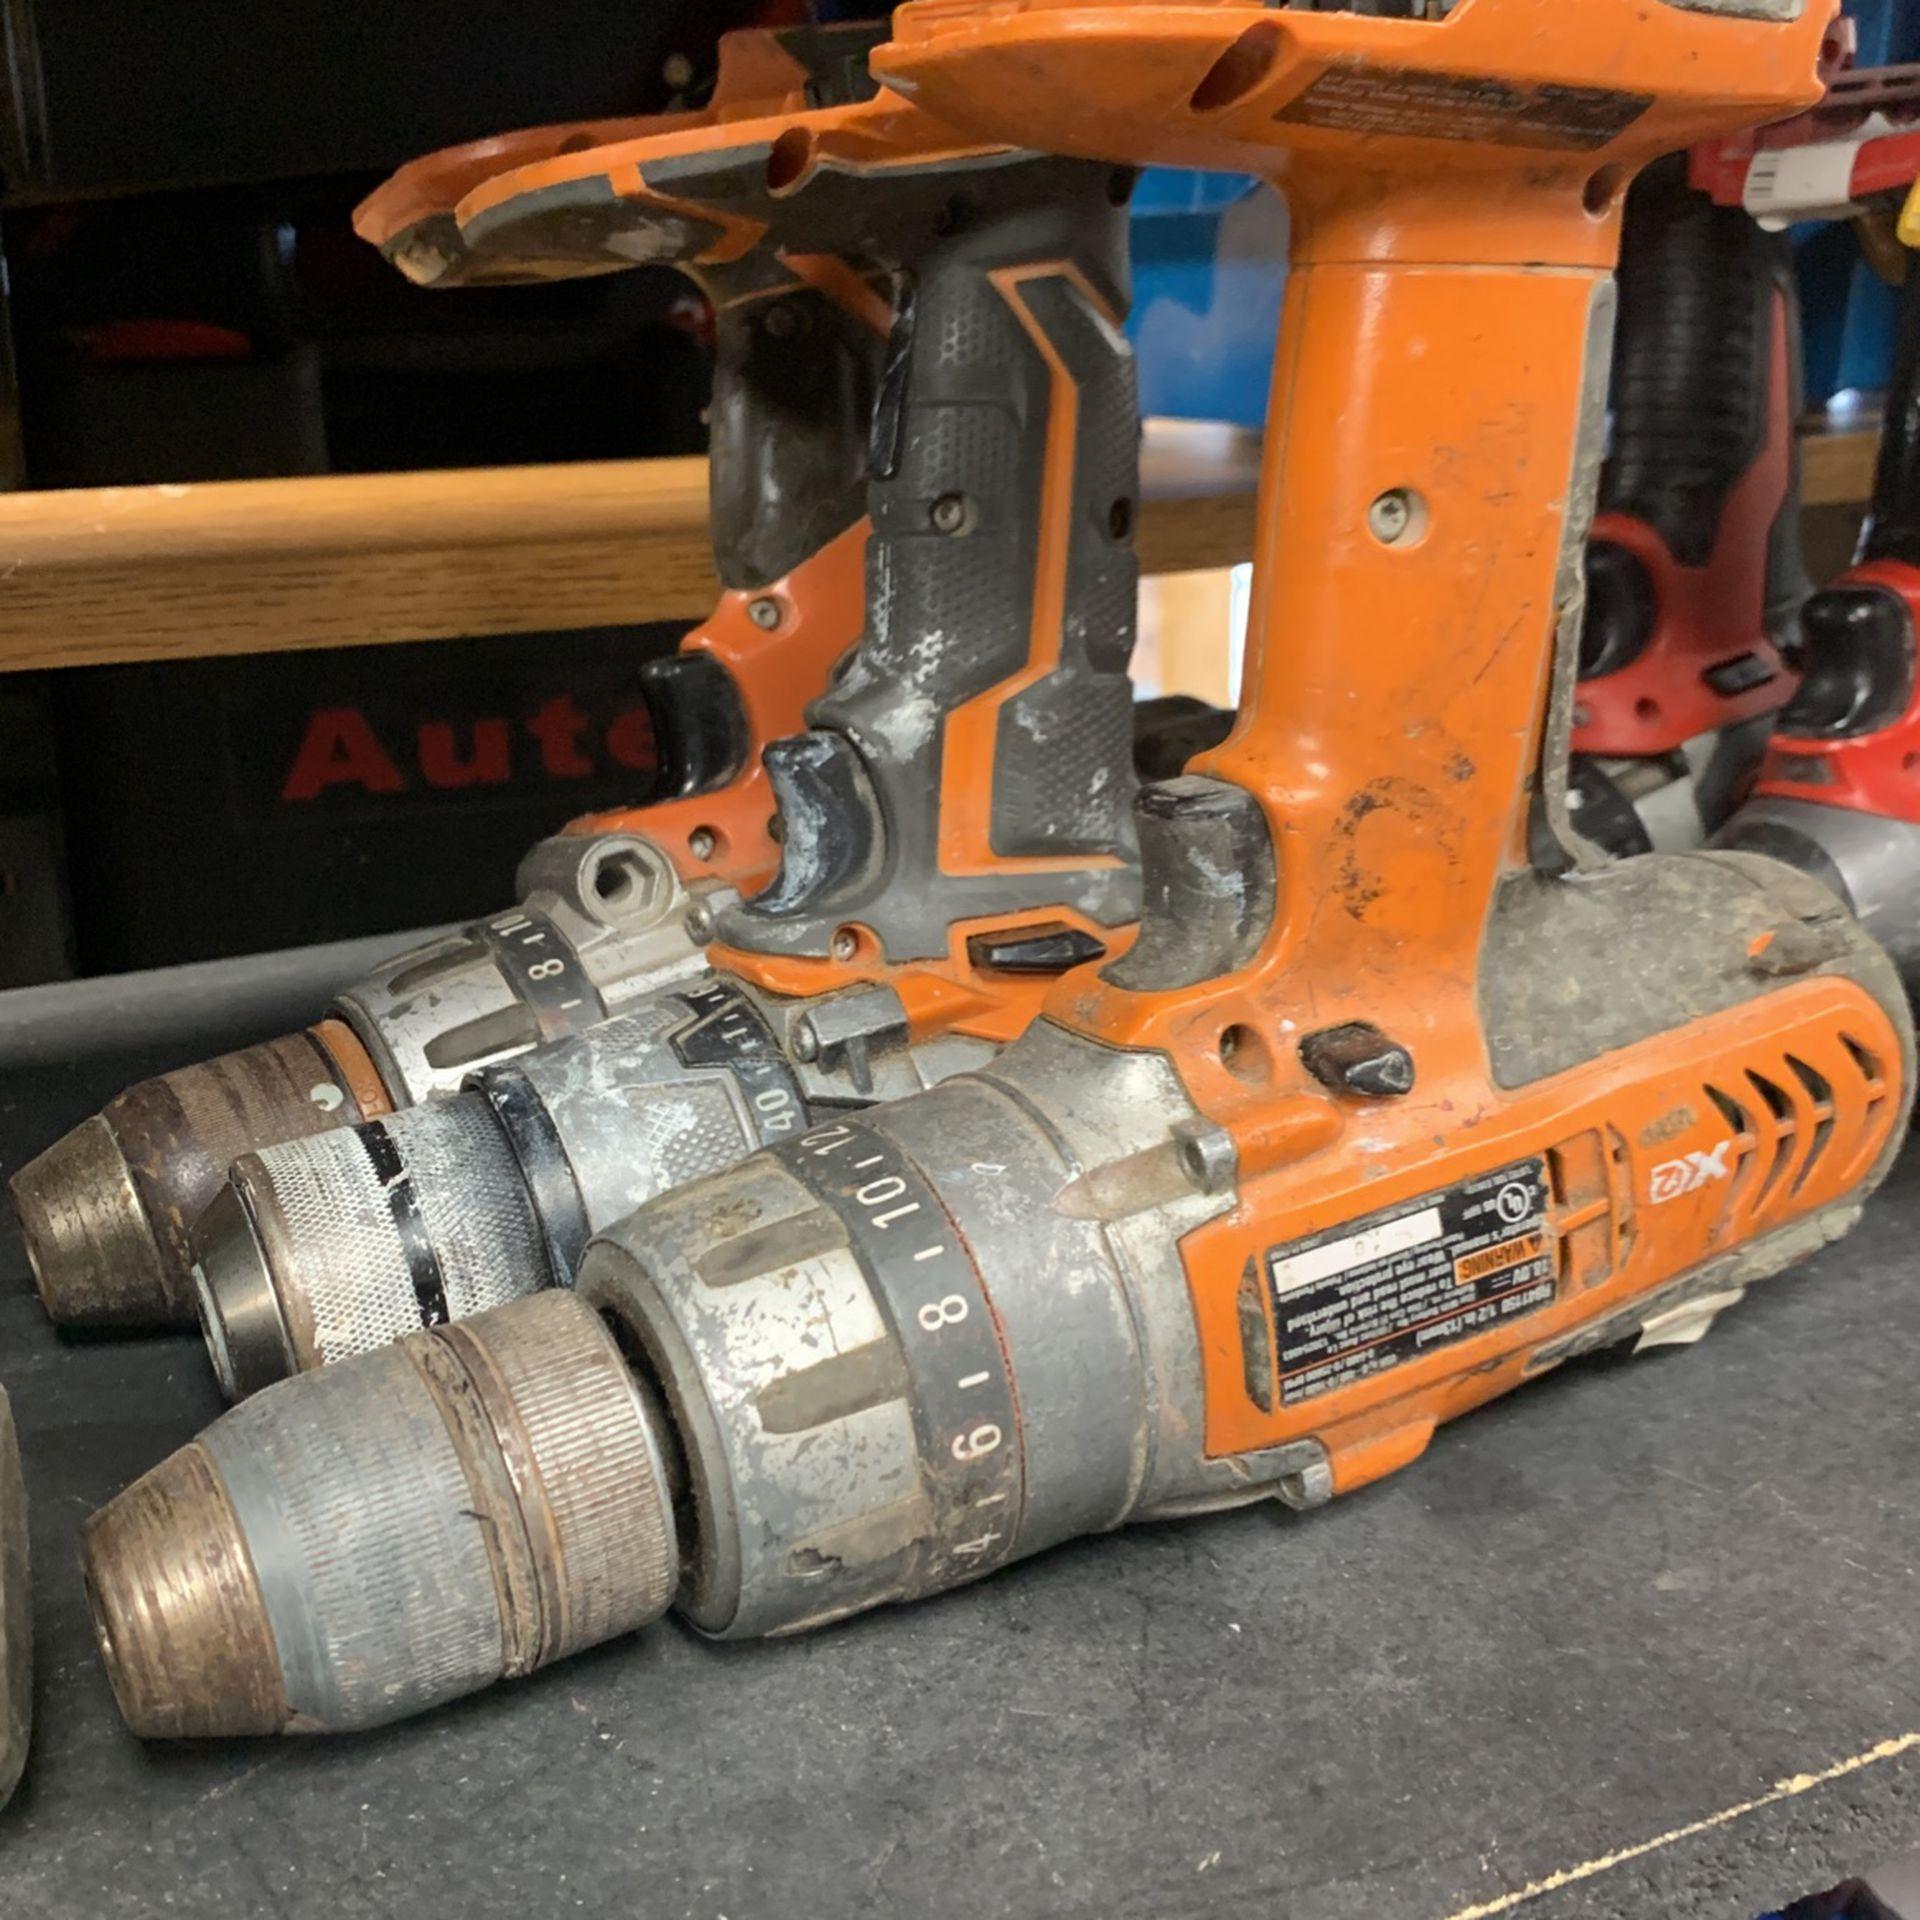 Ridged Drills and Impacts